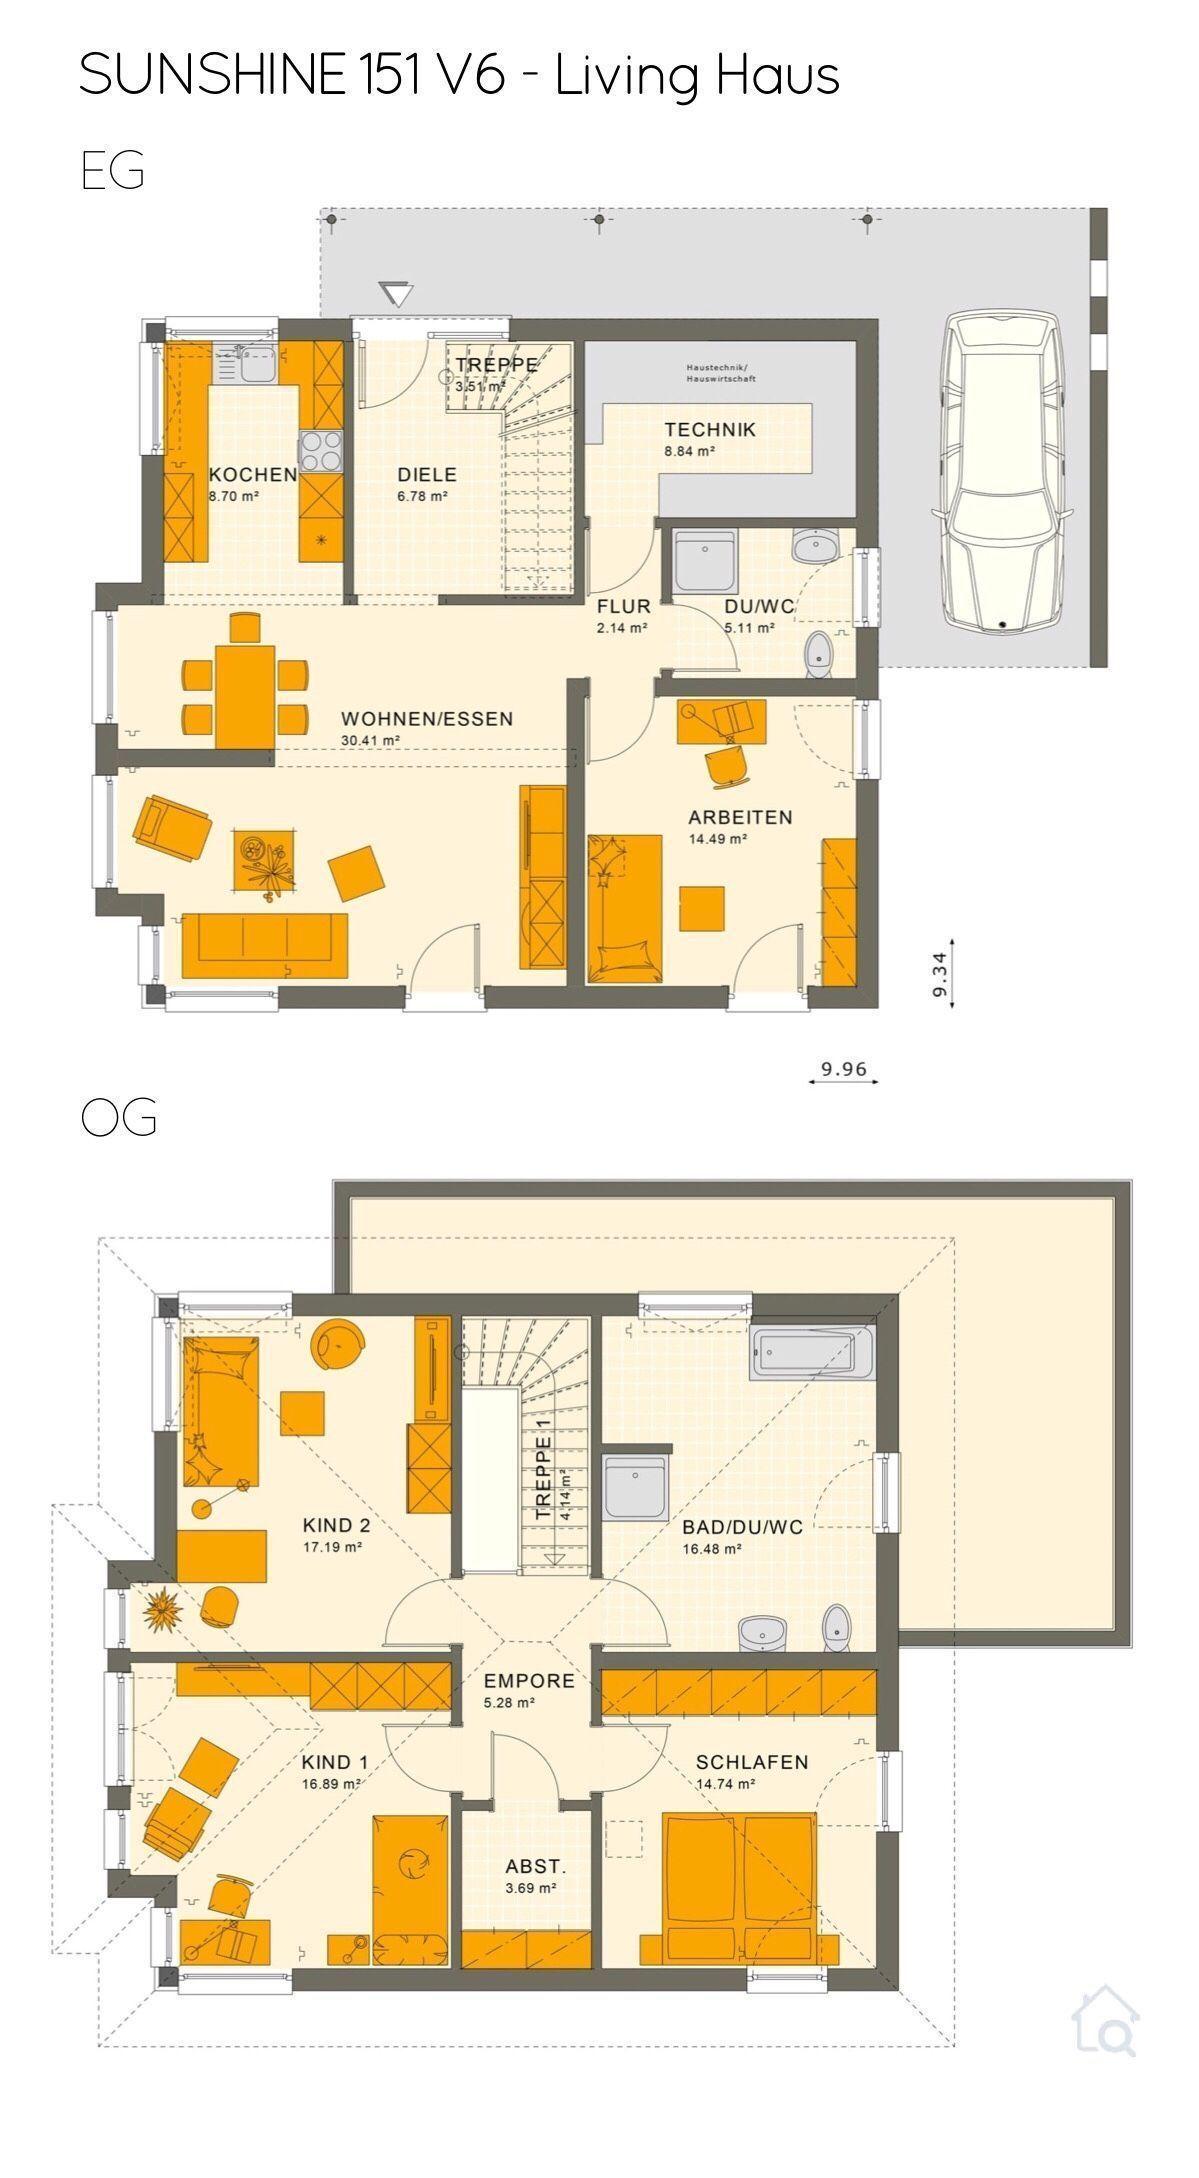 #balkon kamar atas malam Stadtvilla SUNSHINE 151 V6 – Living Haus | HausbauDirek… – Anbau